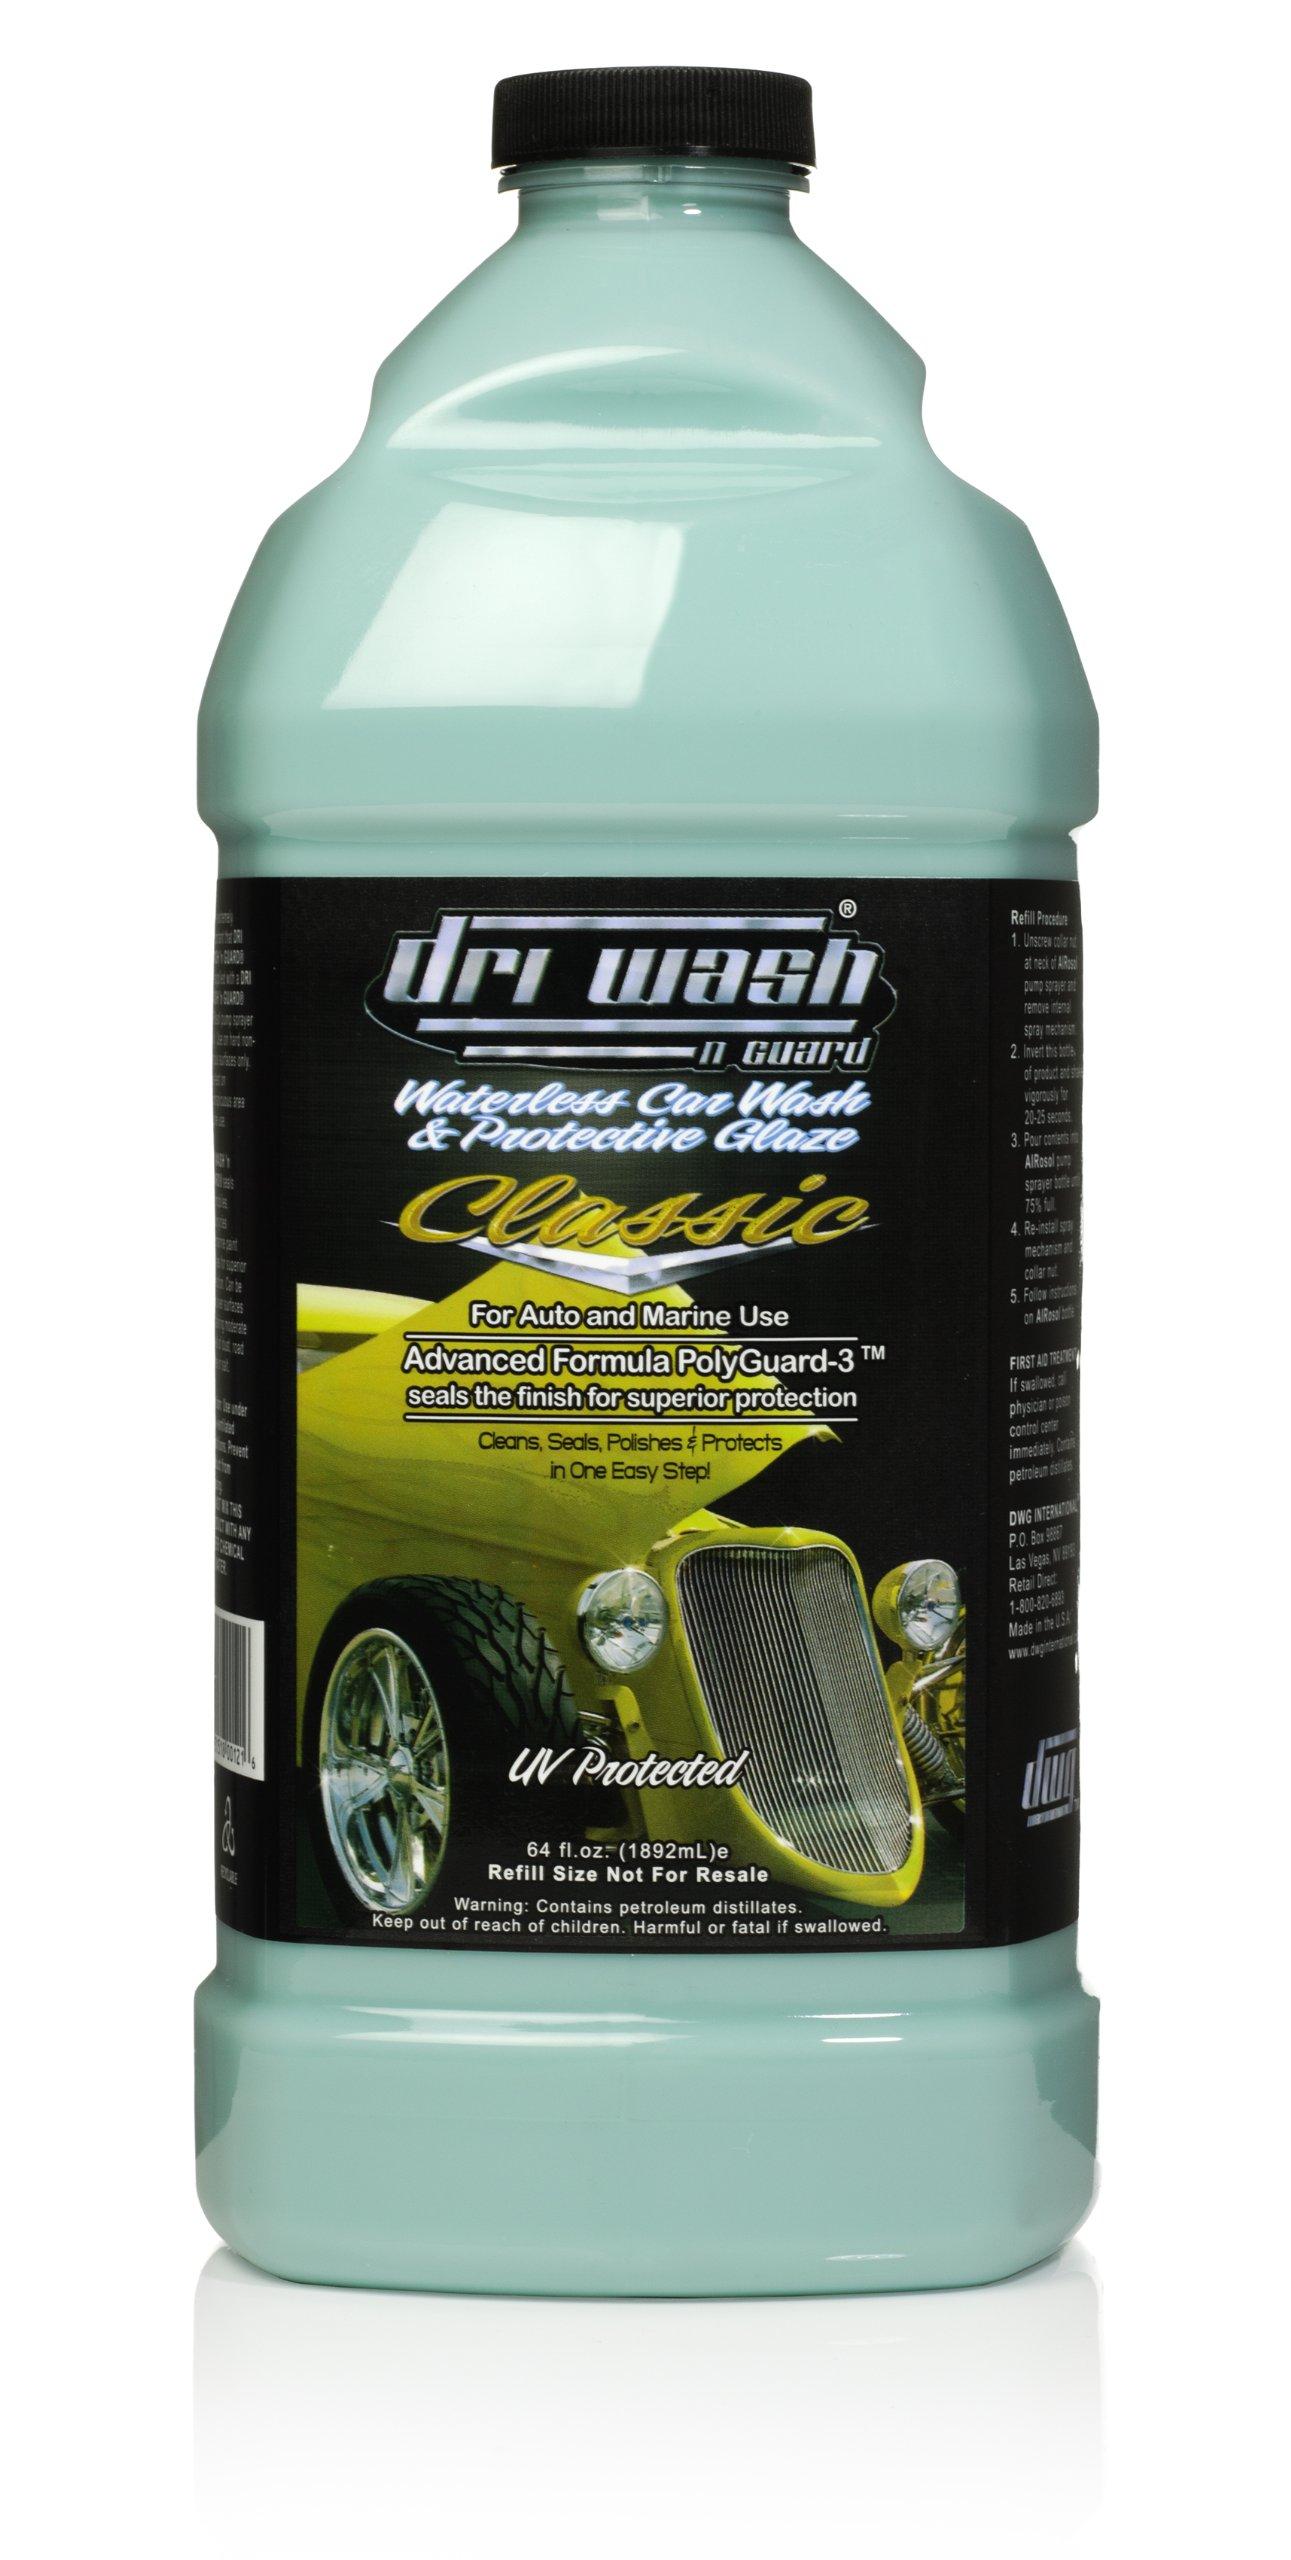 64oz Dri Wash 'n Guard Classic Waterless Car Wash